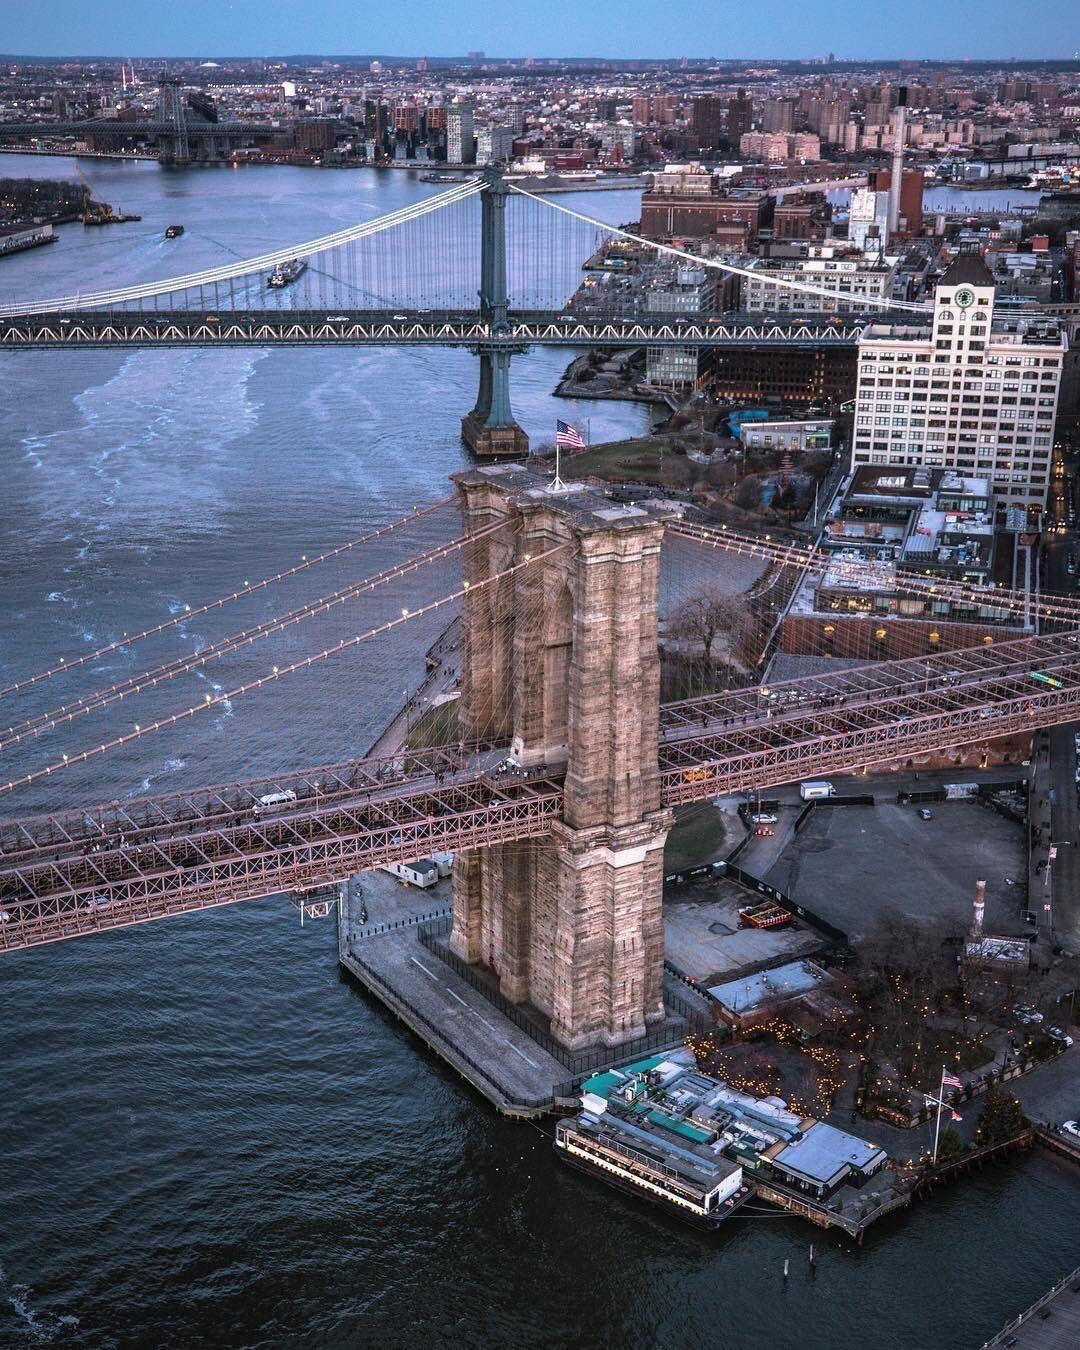 Brooklyn Staten Island Car: Brooklyn And Manhattan Bridges! The Structure In The